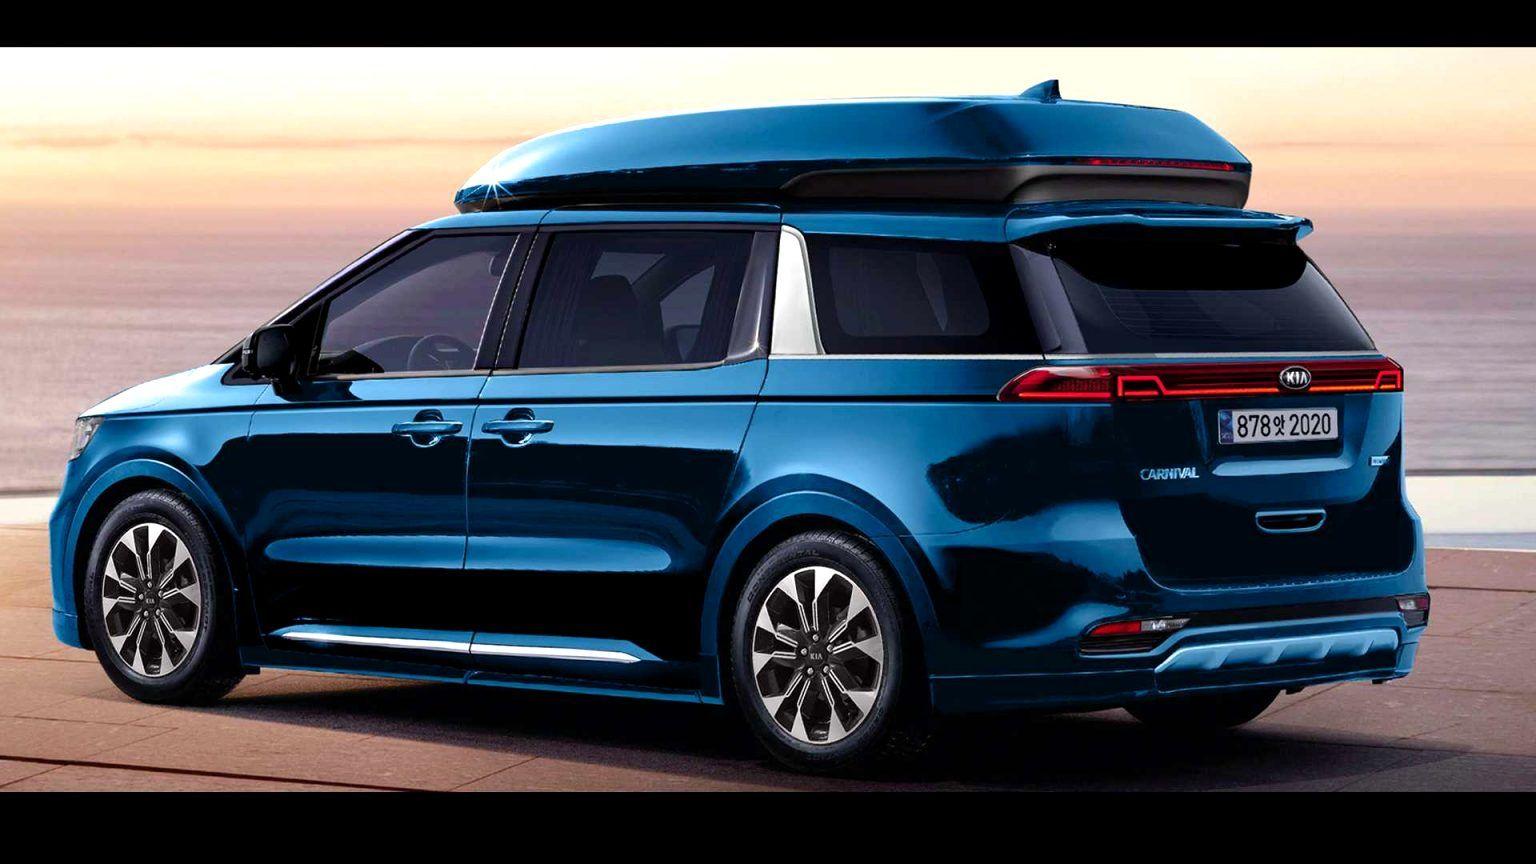 2021 Kia Minivan Pictures In 2021 Kia Sedona Kia Mini Van